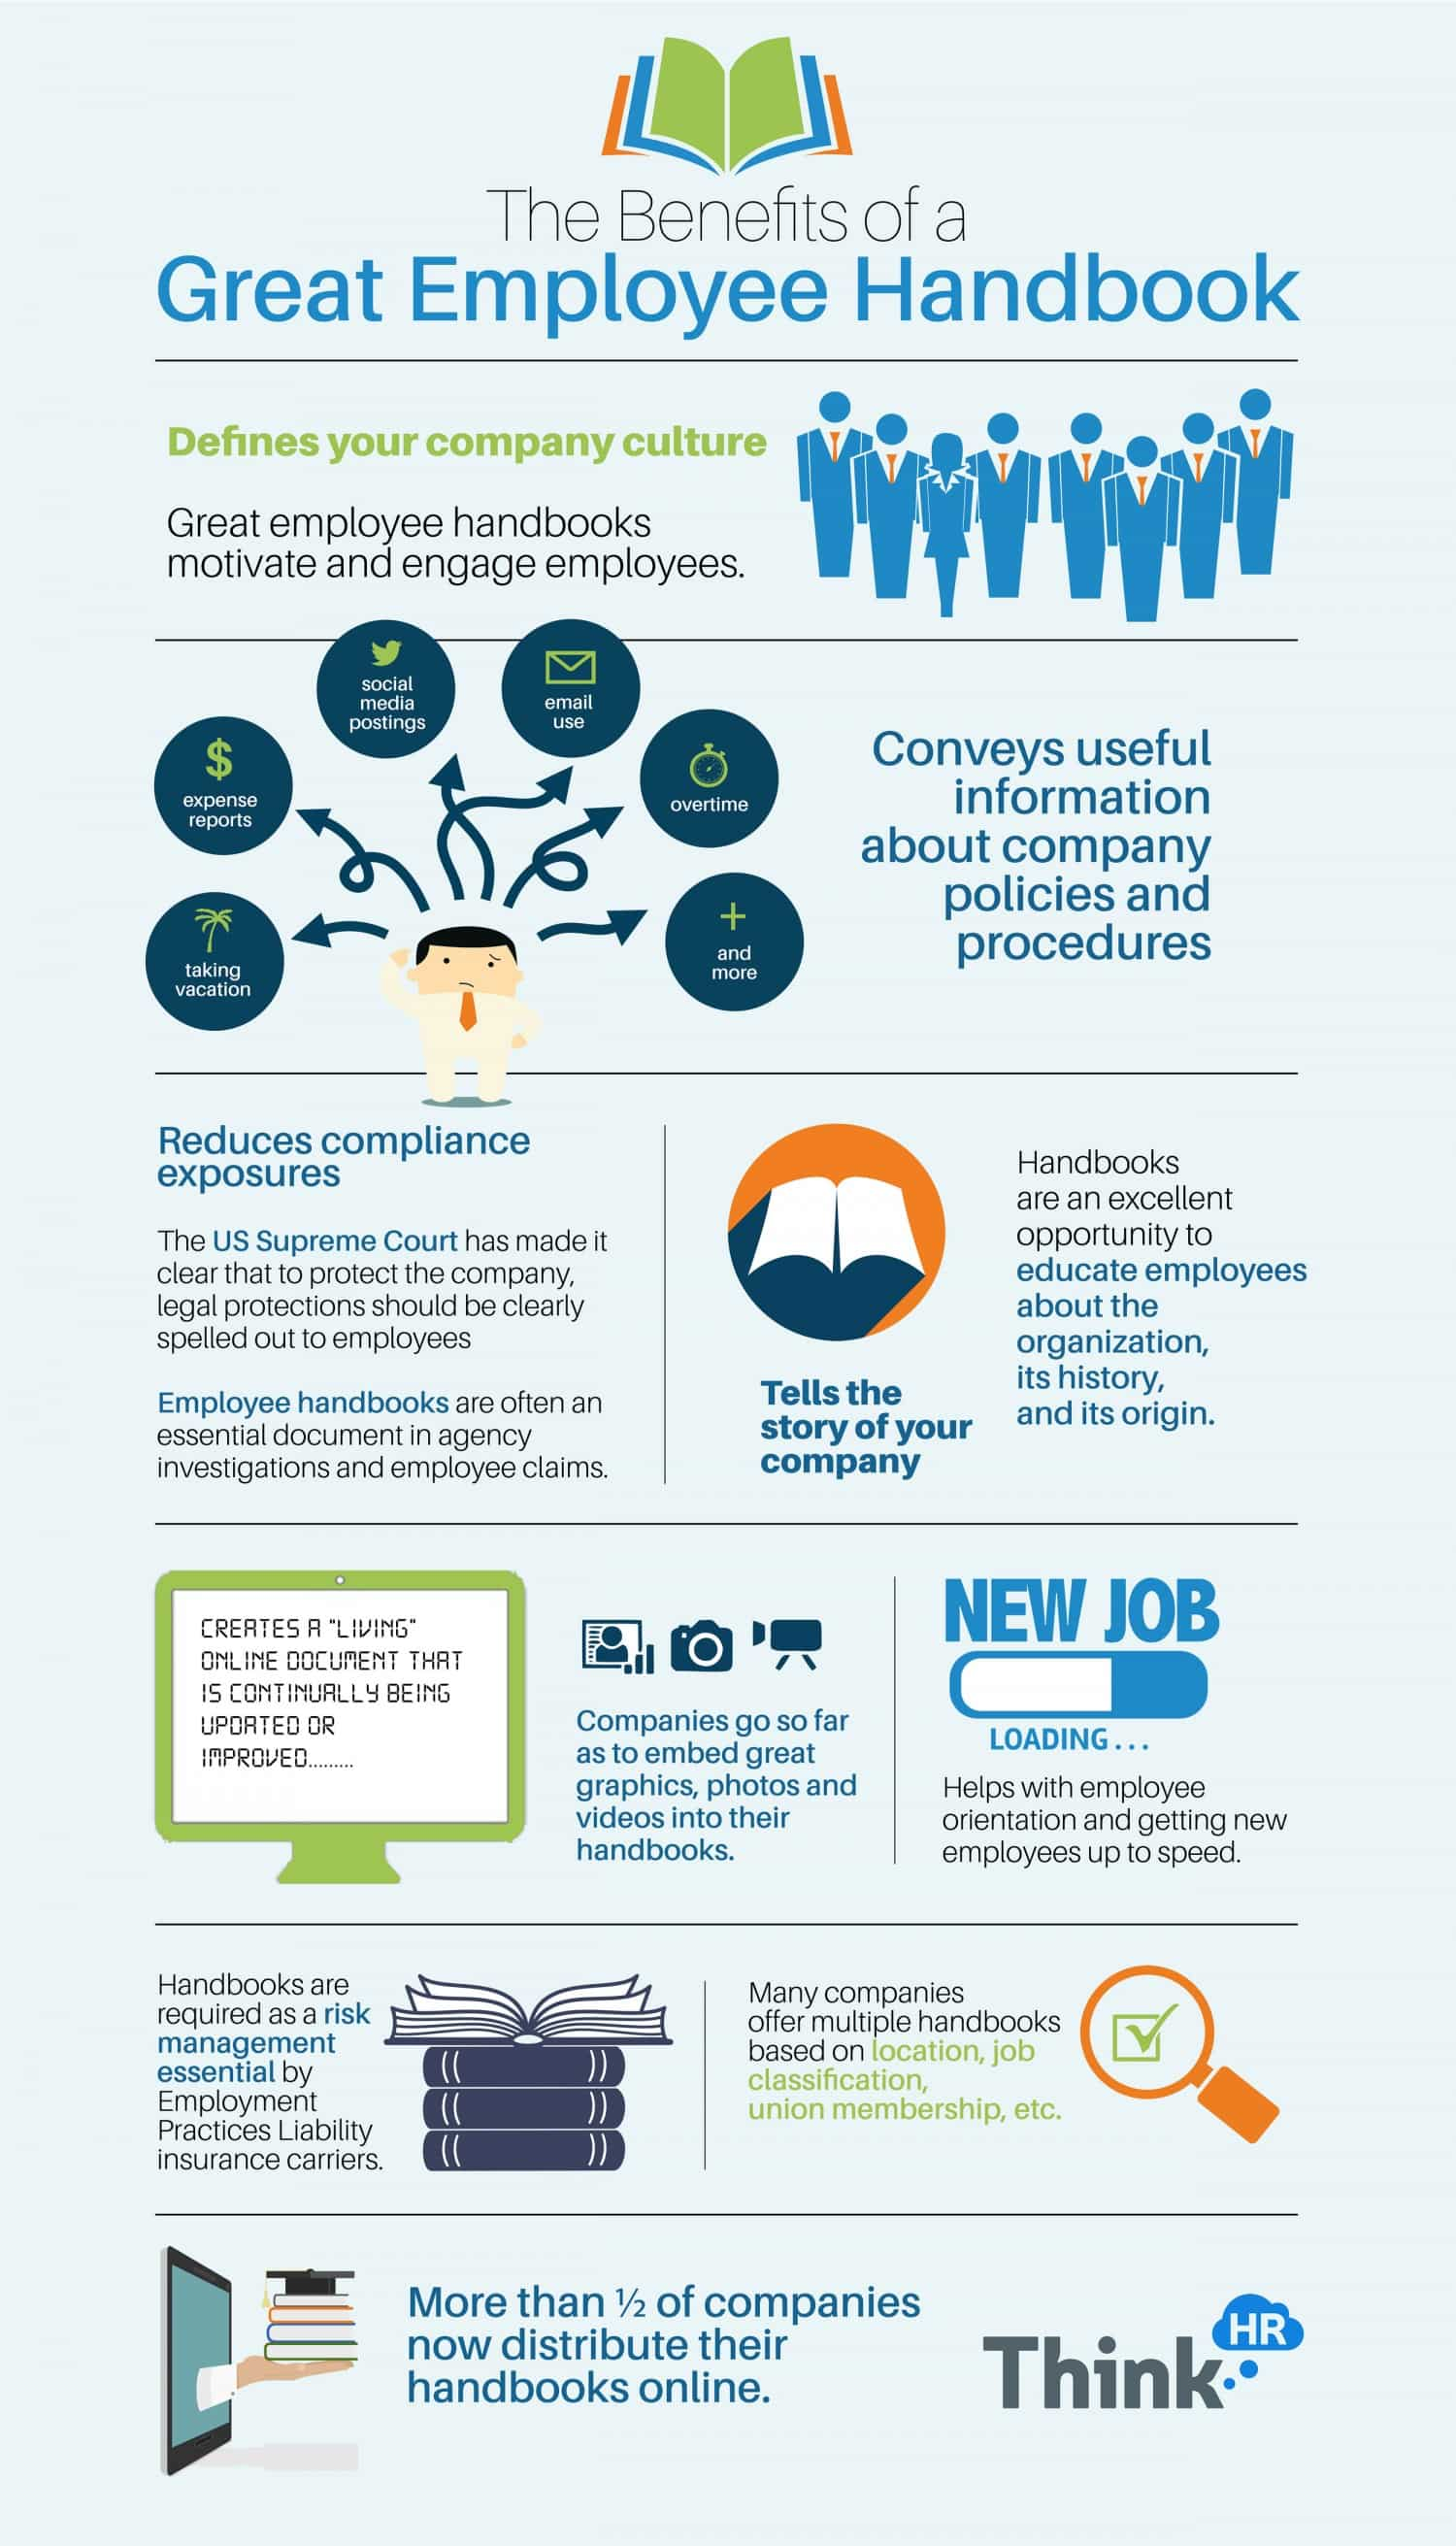 The Benefits Of A Great Employee Handbook 55ce348e451b3